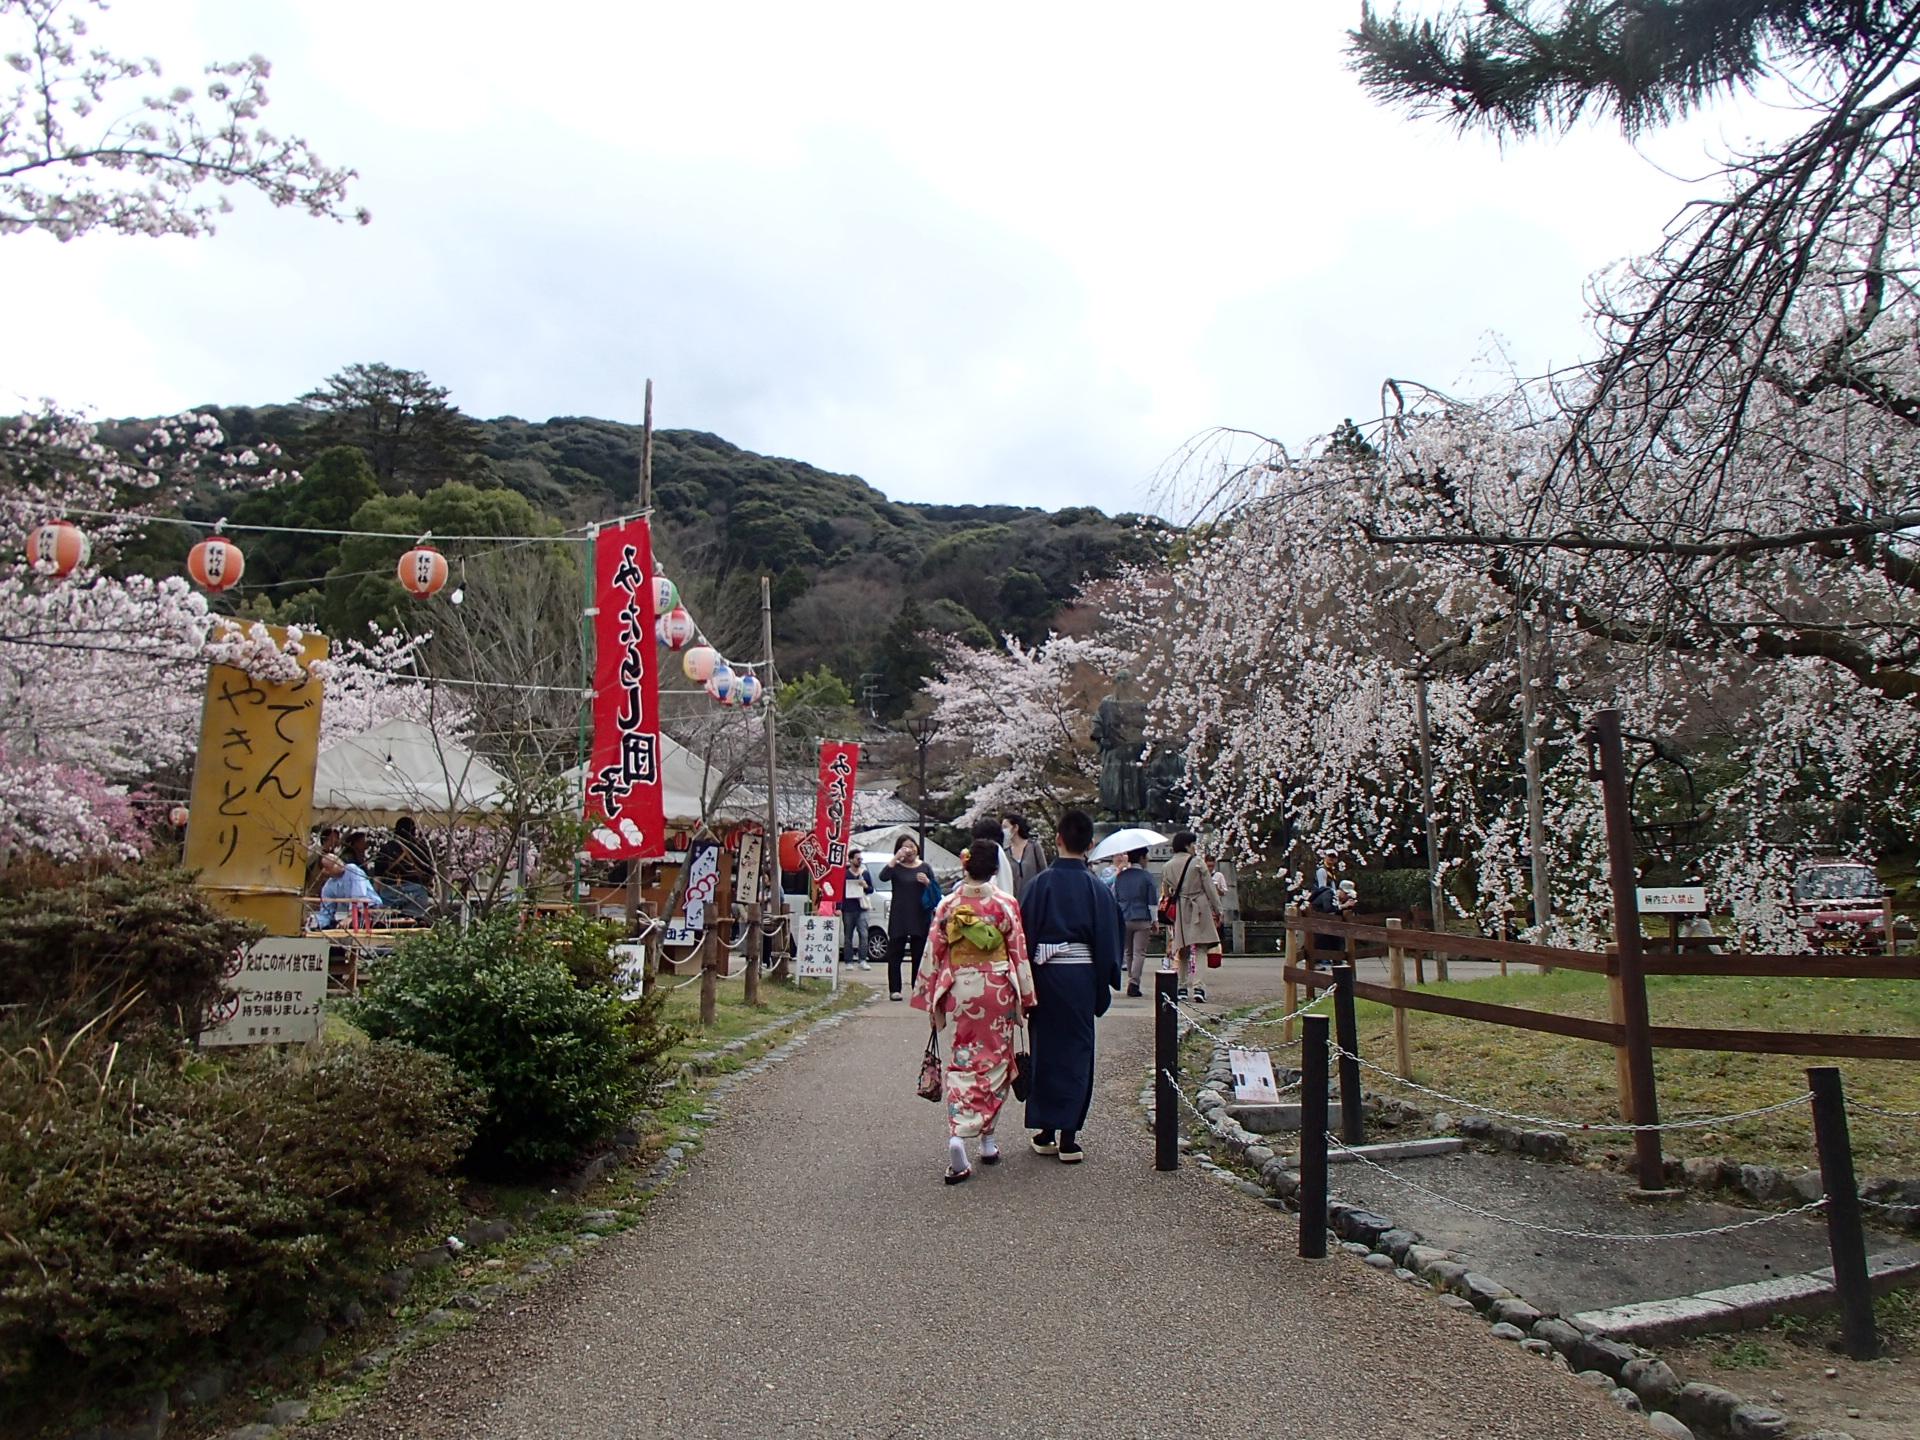 http://www.kyoto-ga.jp/event/thumb/kyokai/P4023267.JPG